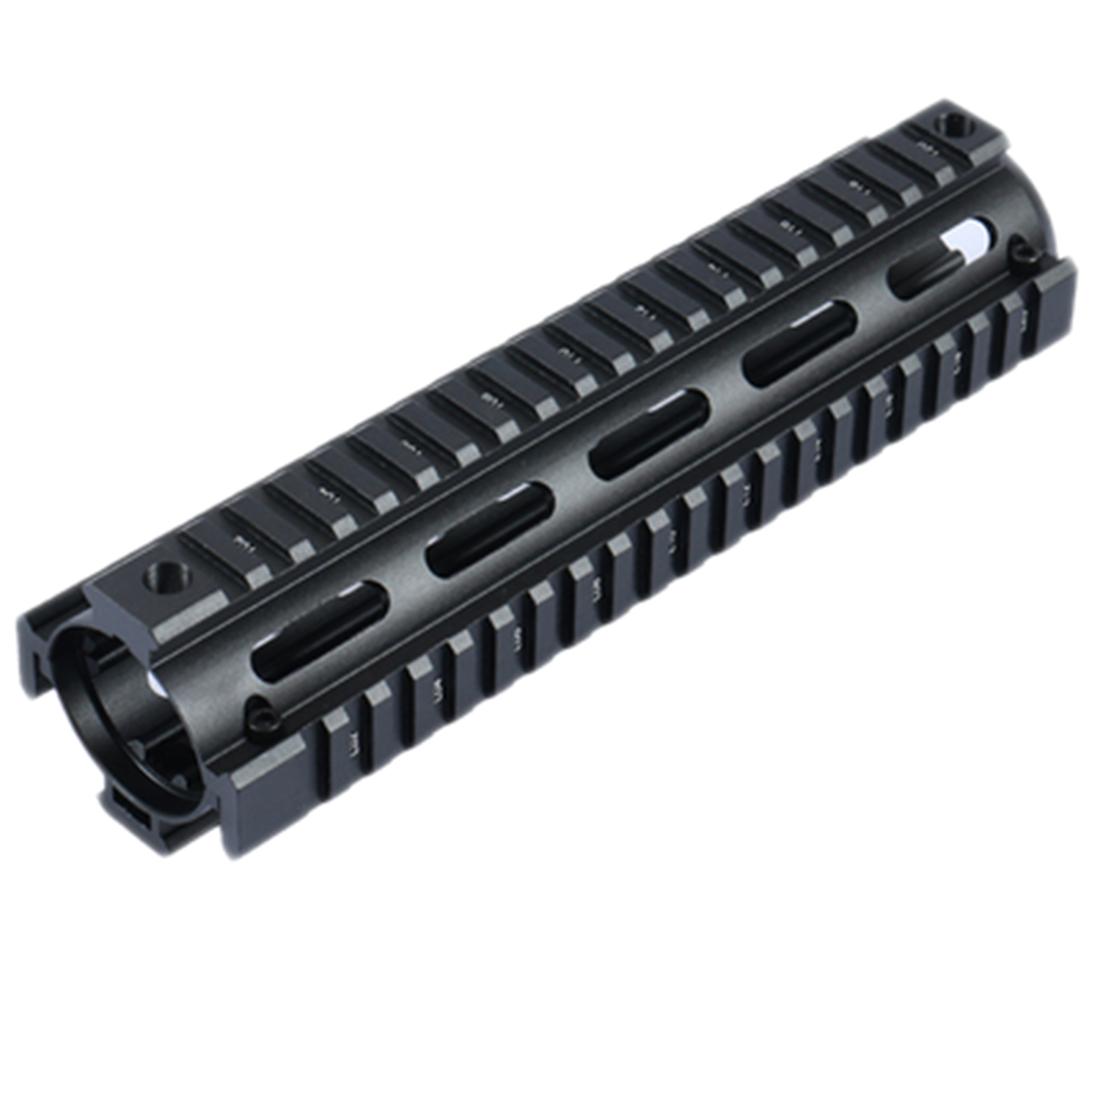 M016 9 Inch Metal Handguard for JM Gen 9 M4 Gel Blaster